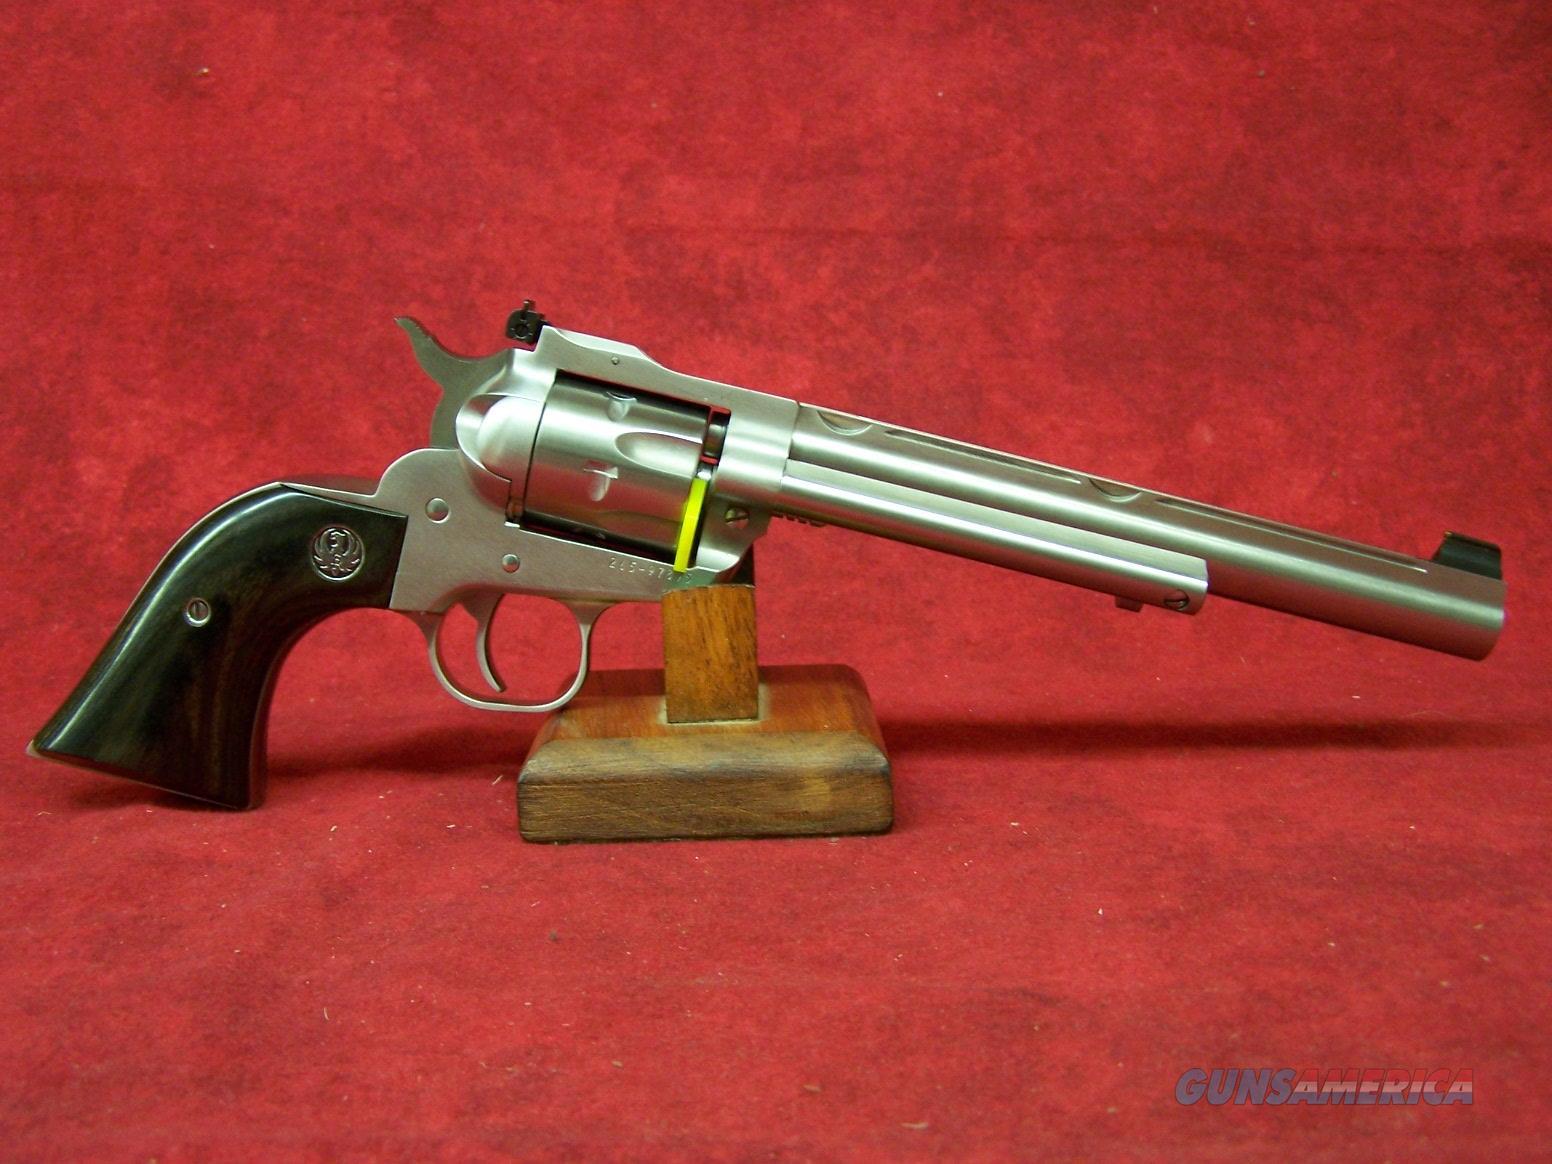 "Ruger Single Six Hunter 22LR/22WMRF 7.5"" Barrel (00662)  Guns > Pistols > Ruger Single Action Revolvers > Single Six Type"